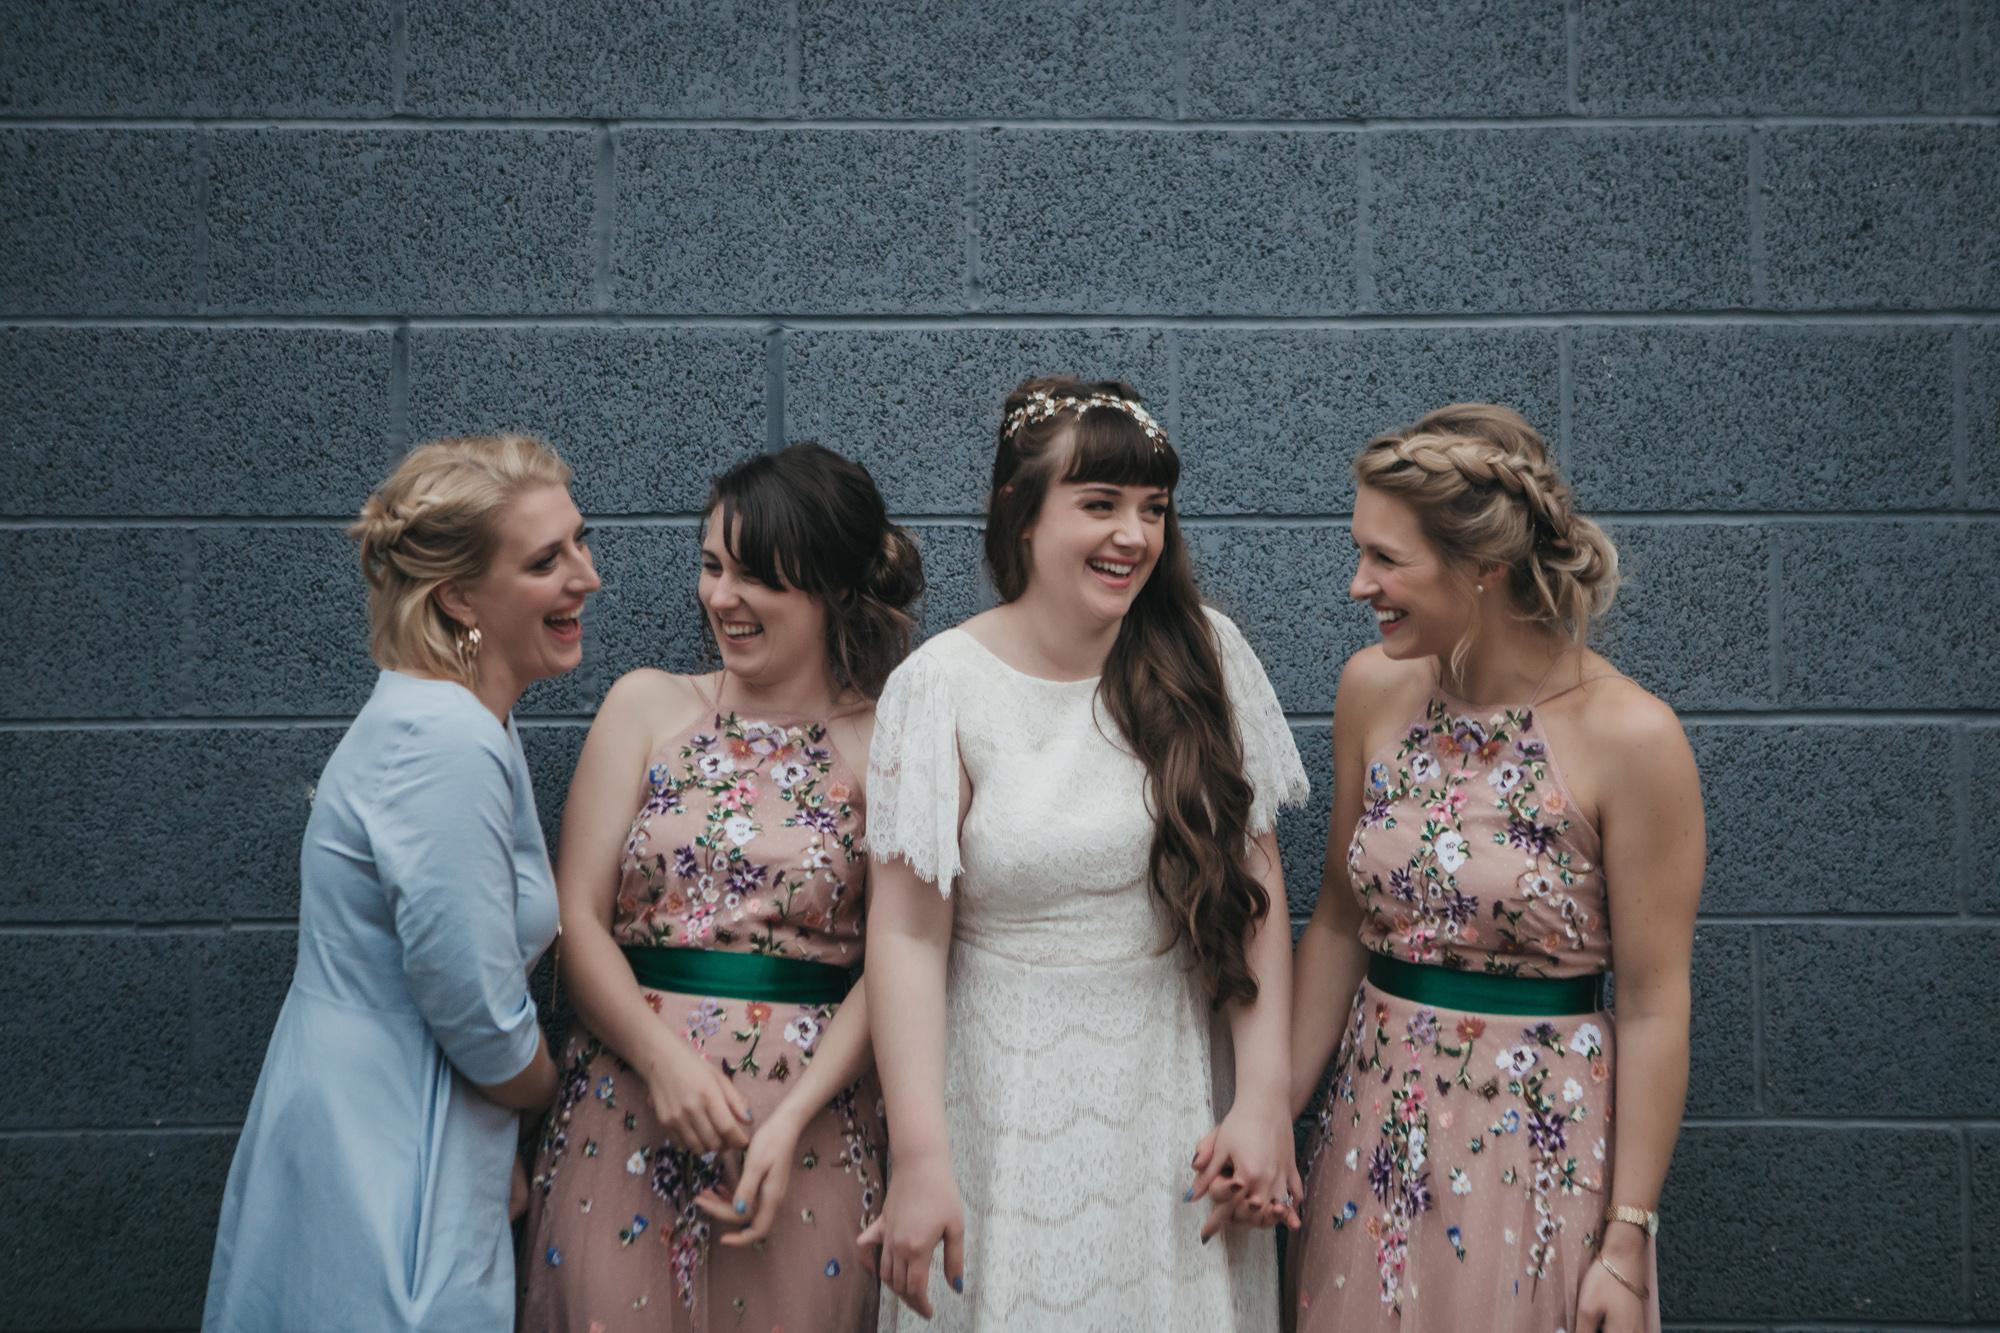 Kristy-Back-Garden-Outdoor-Wedding-Sheffield-Industrial-Warehouse-Wedding-Bohemian-Kate-Beaumont-Dahlia-Dress-49.jpg